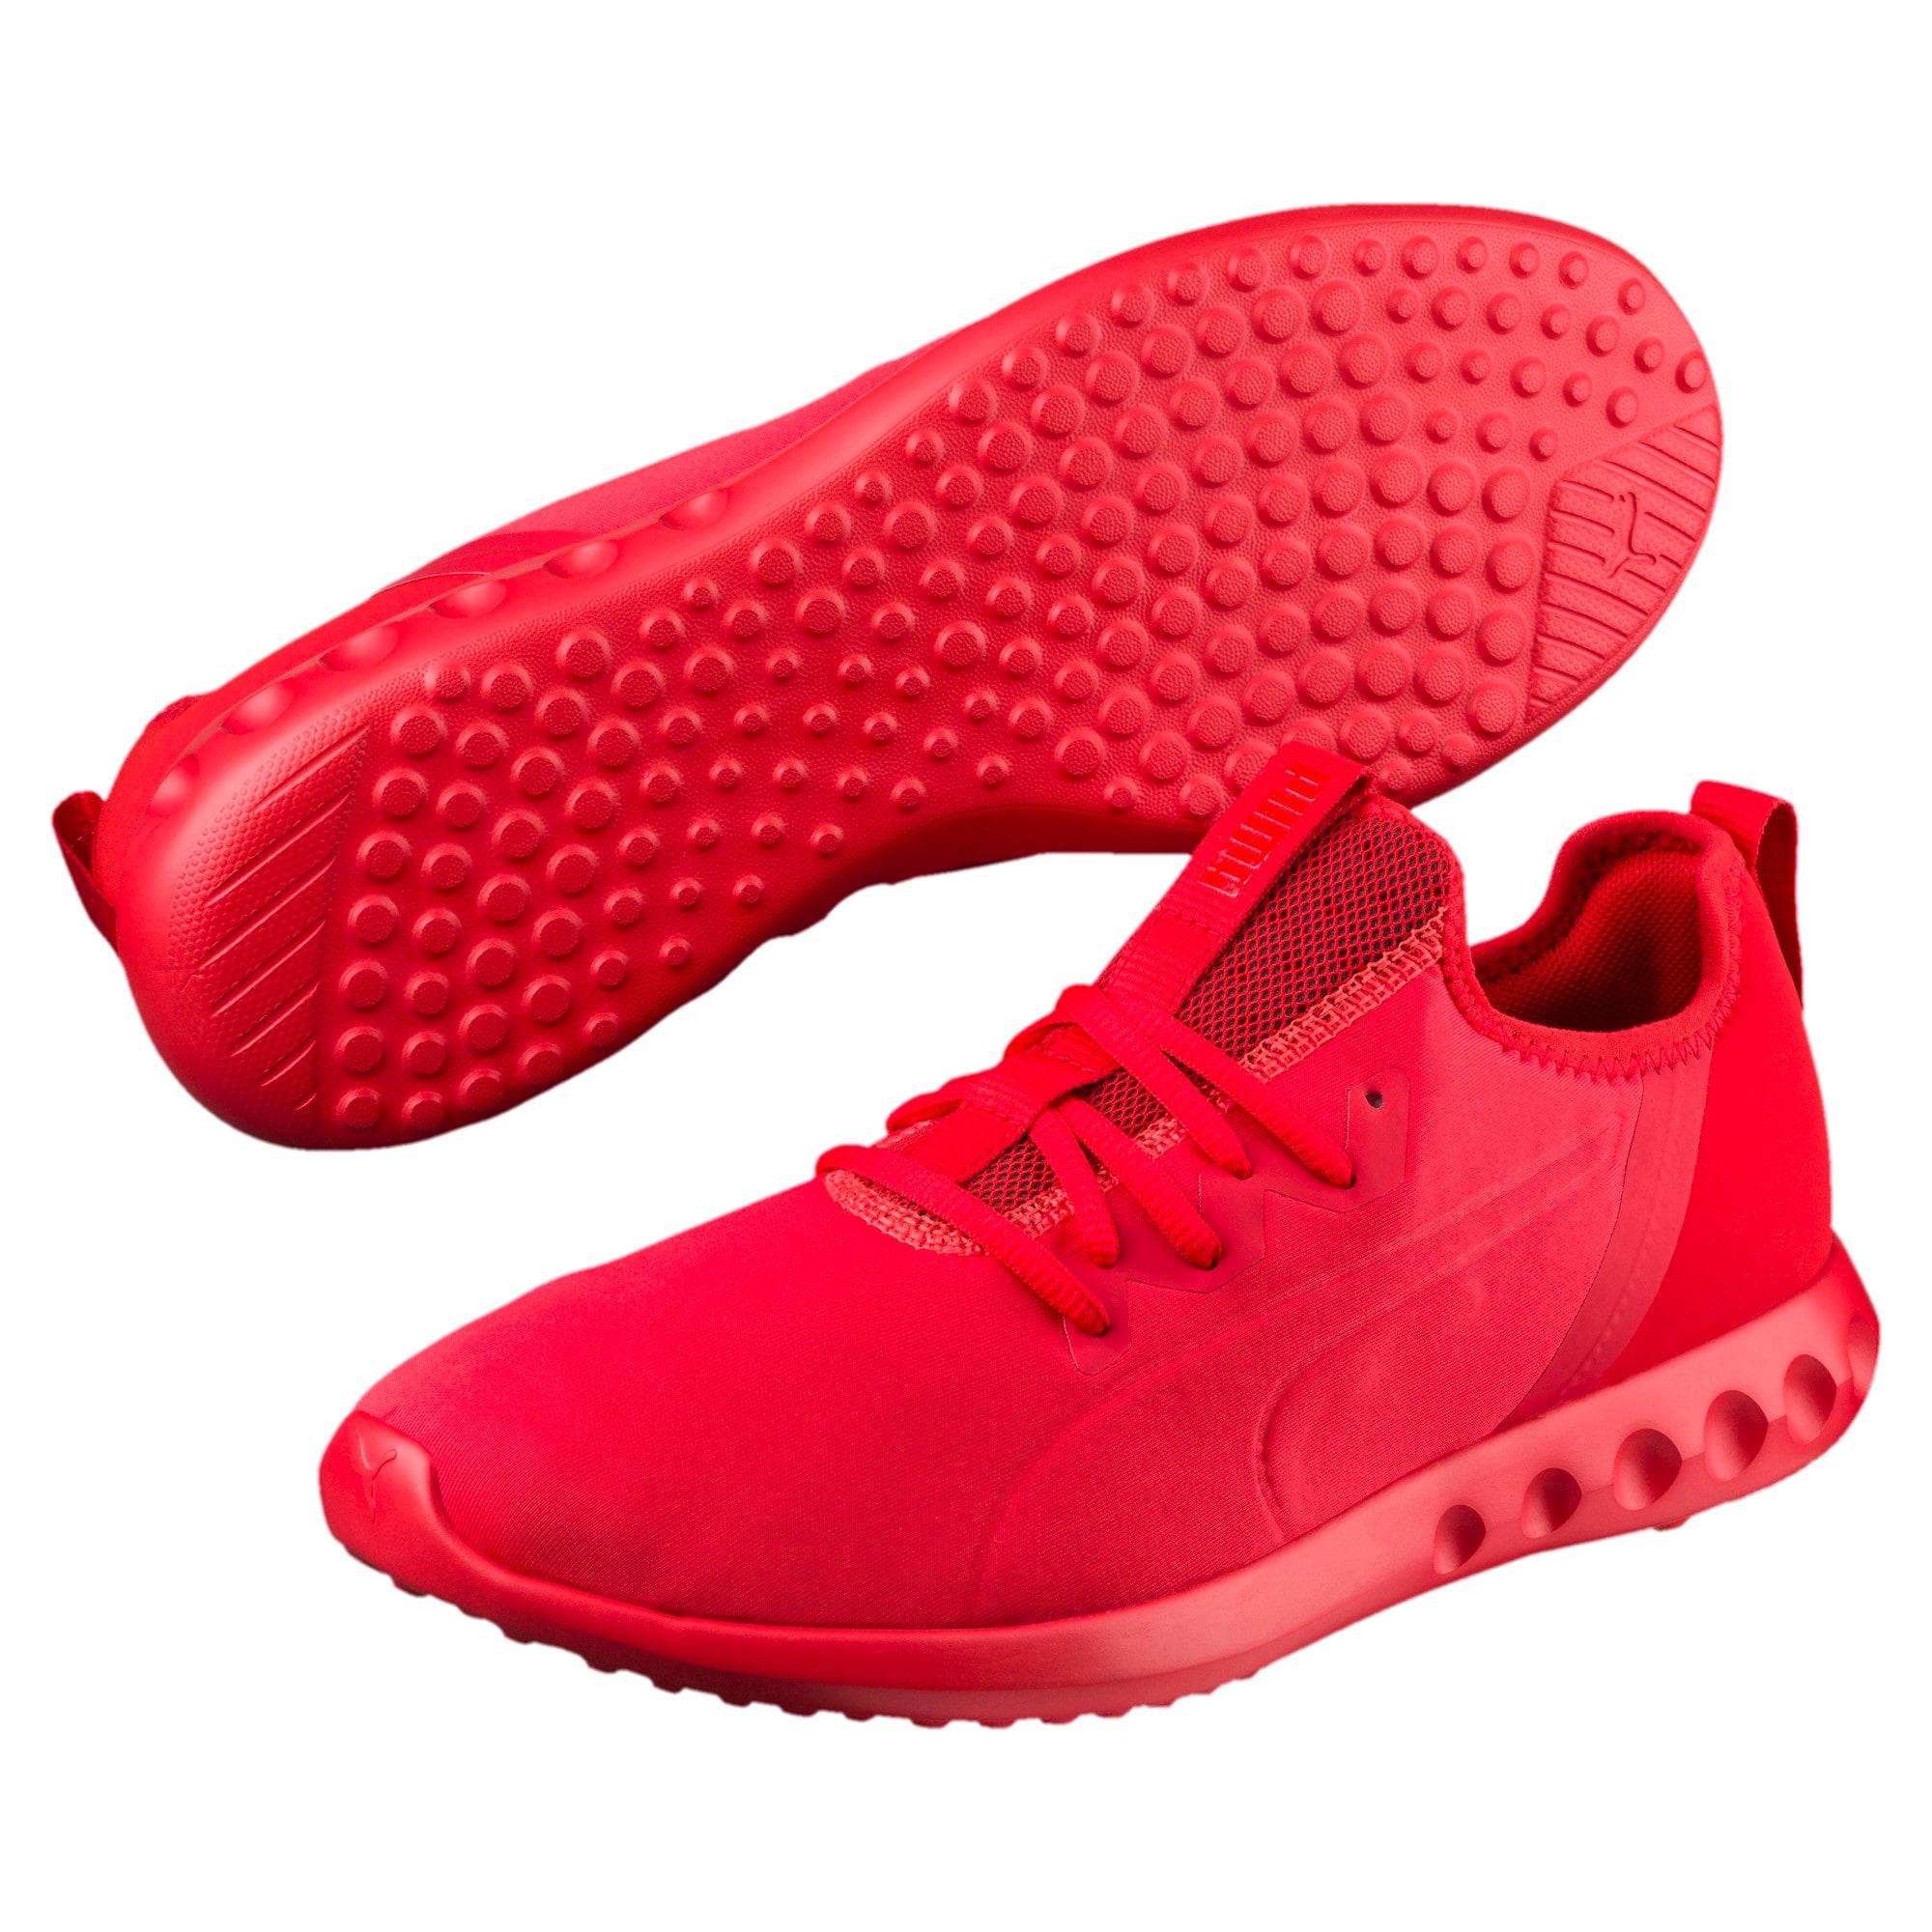 Thumbnail 2 of Carson 2 X Men's Running Shoes, High Risk Red, medium